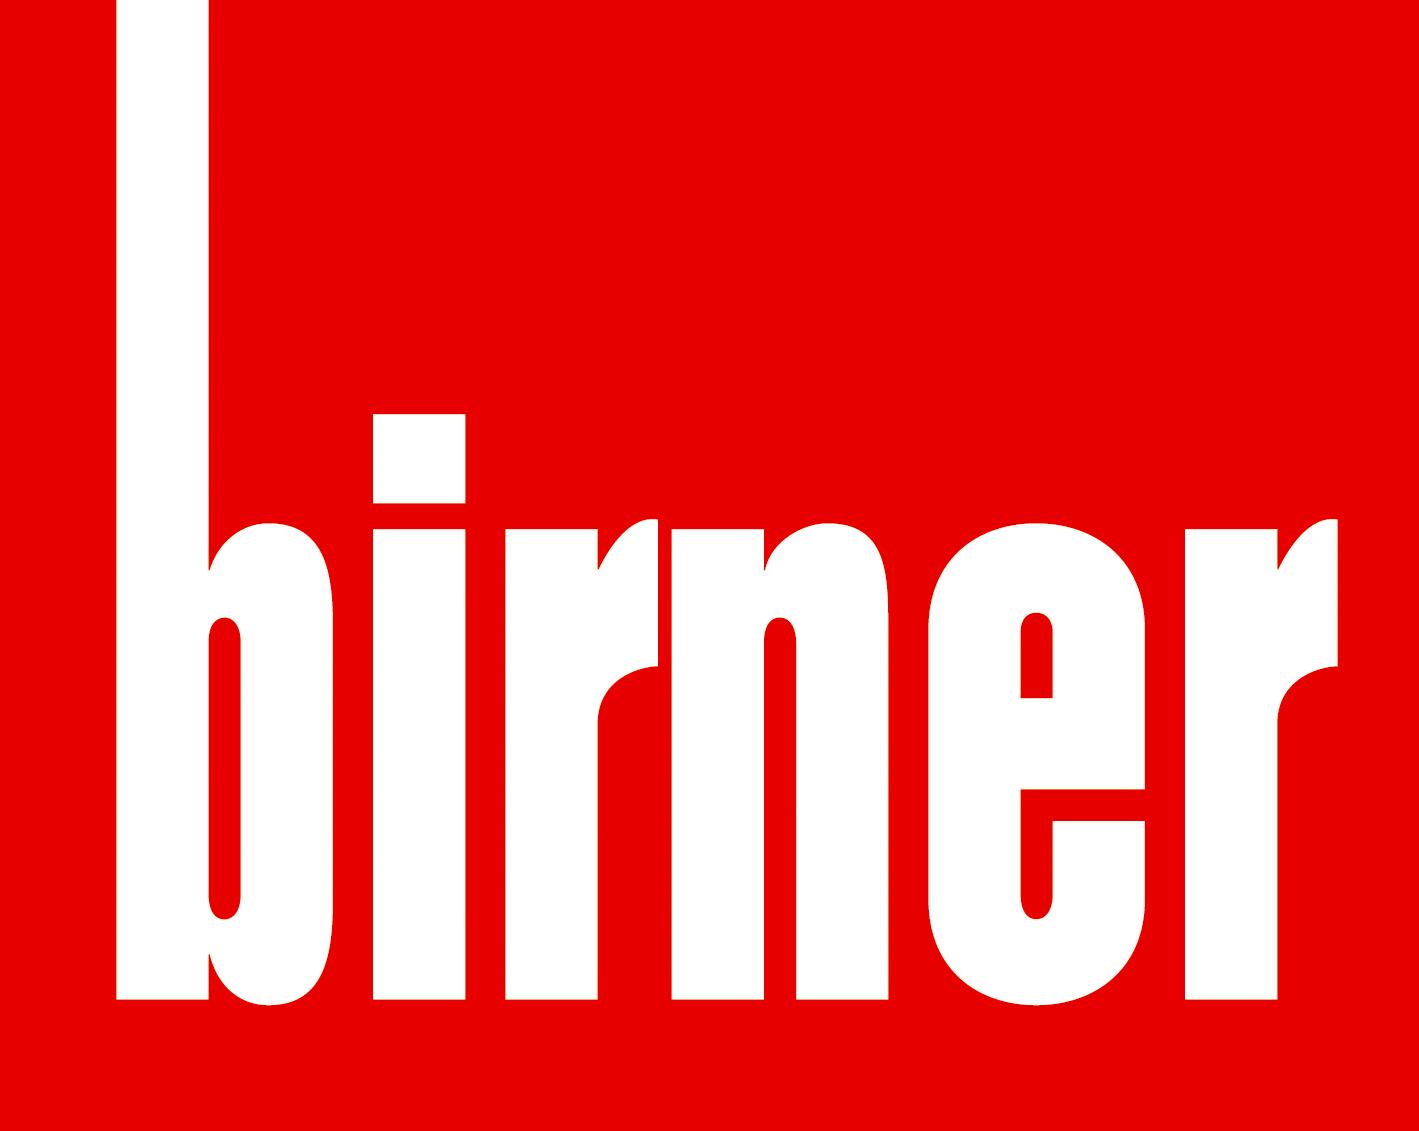 Birner Oberwart